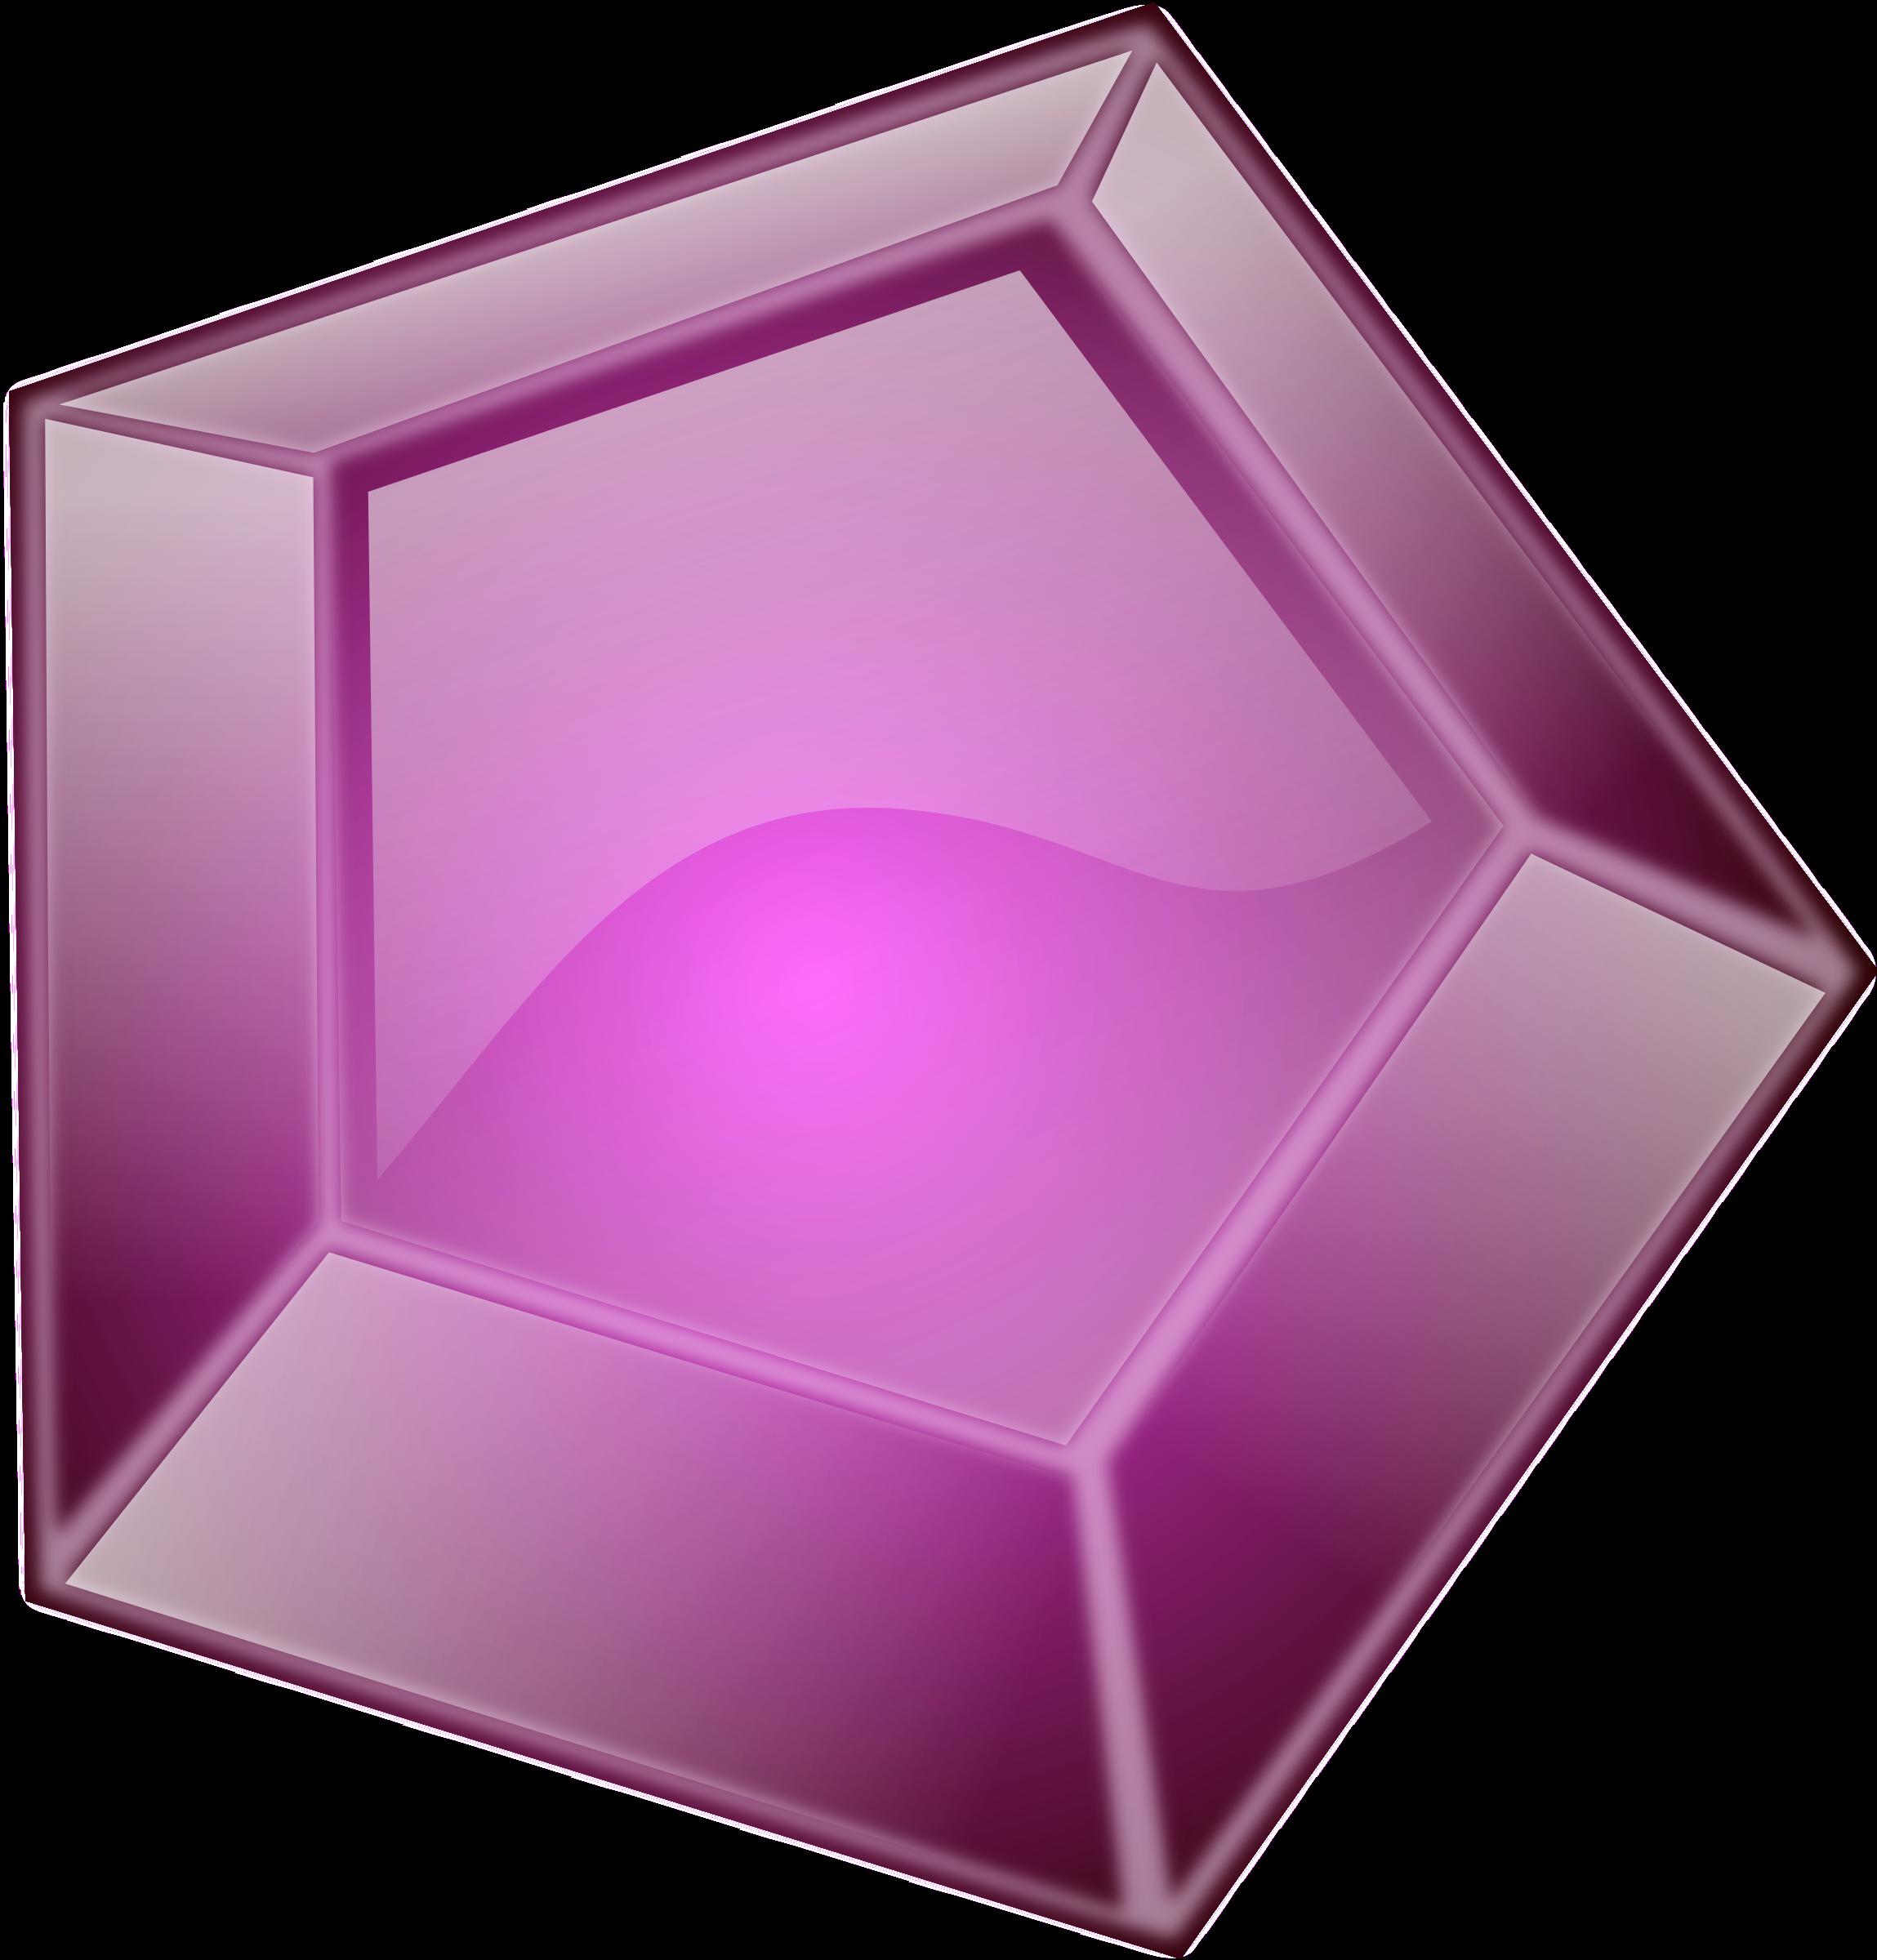 Gems clipart purple diamond RF Diamond Illustrations Purple Clipart